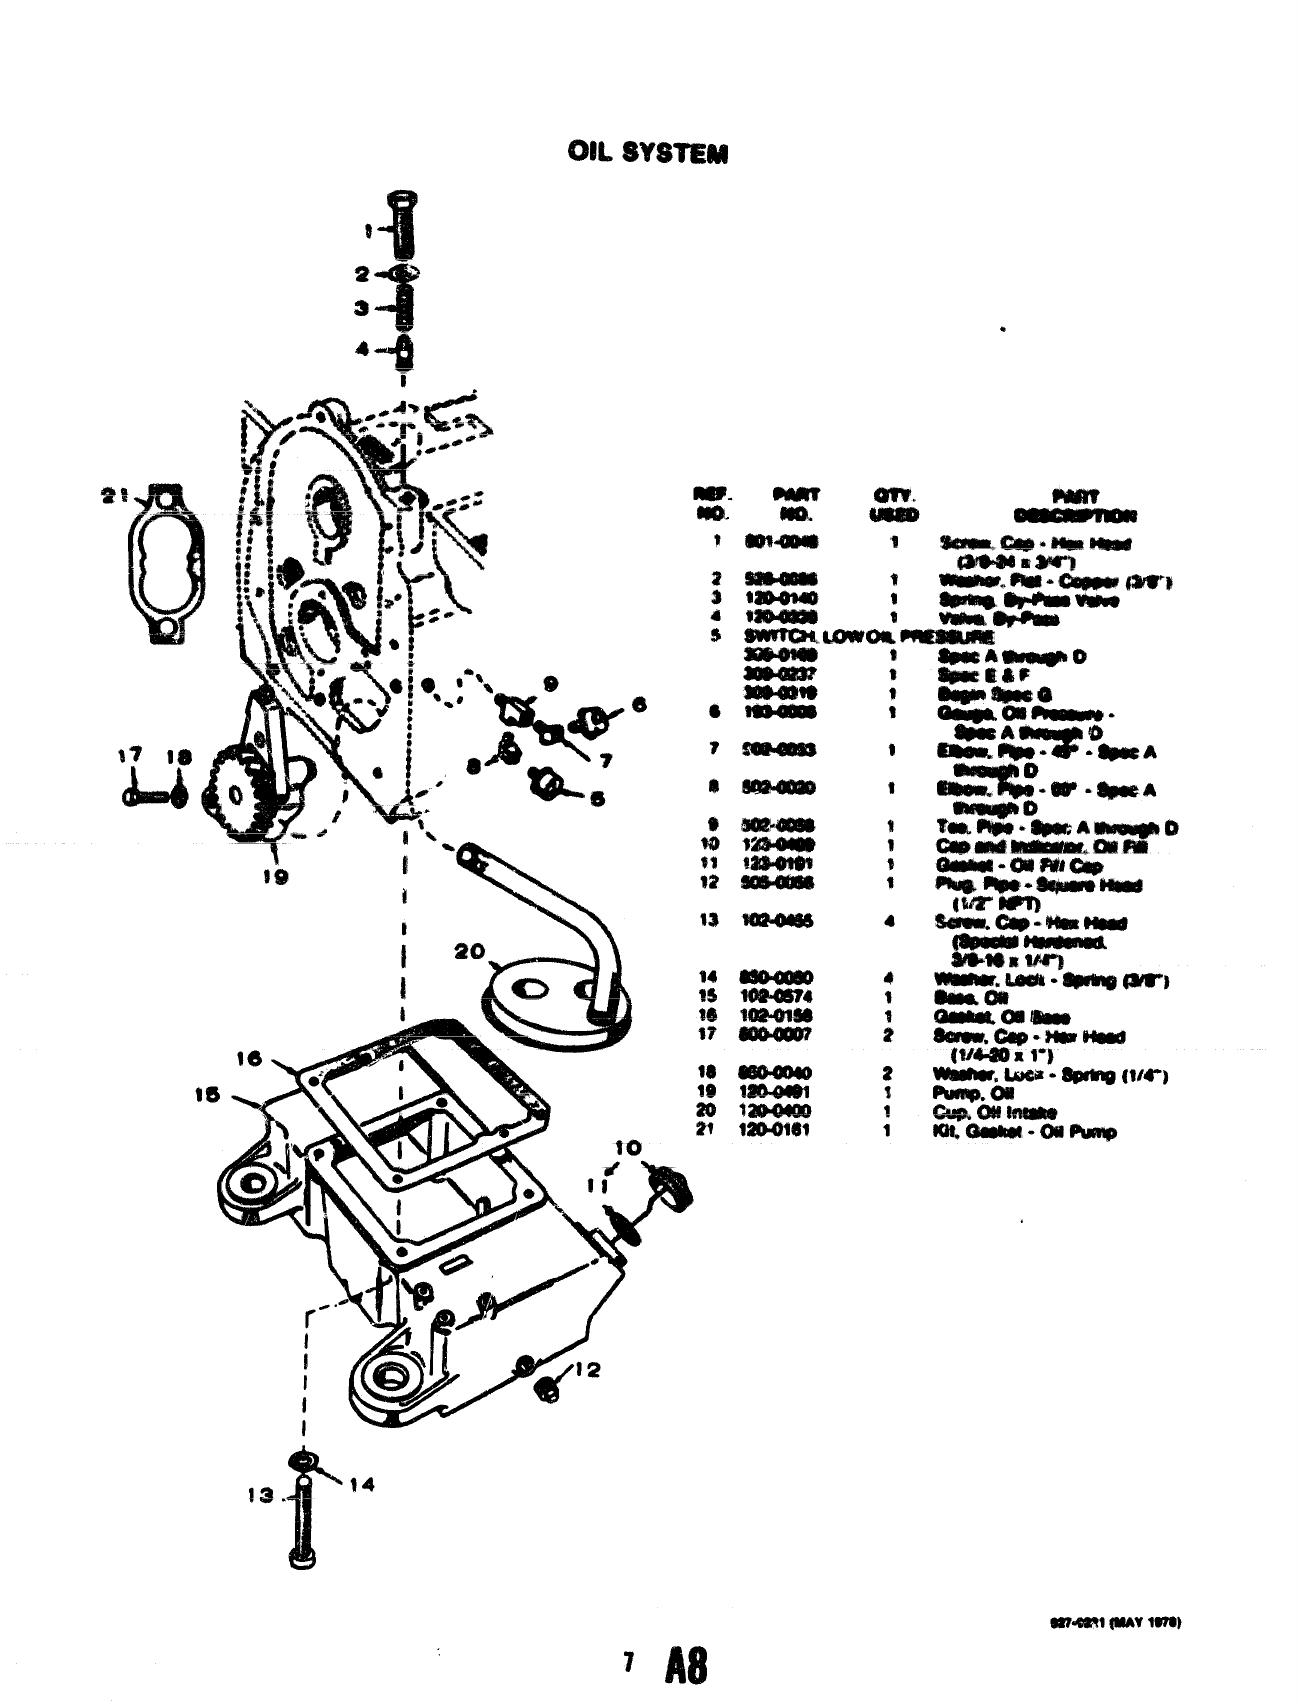 Onan mcck 927 0224 Manual